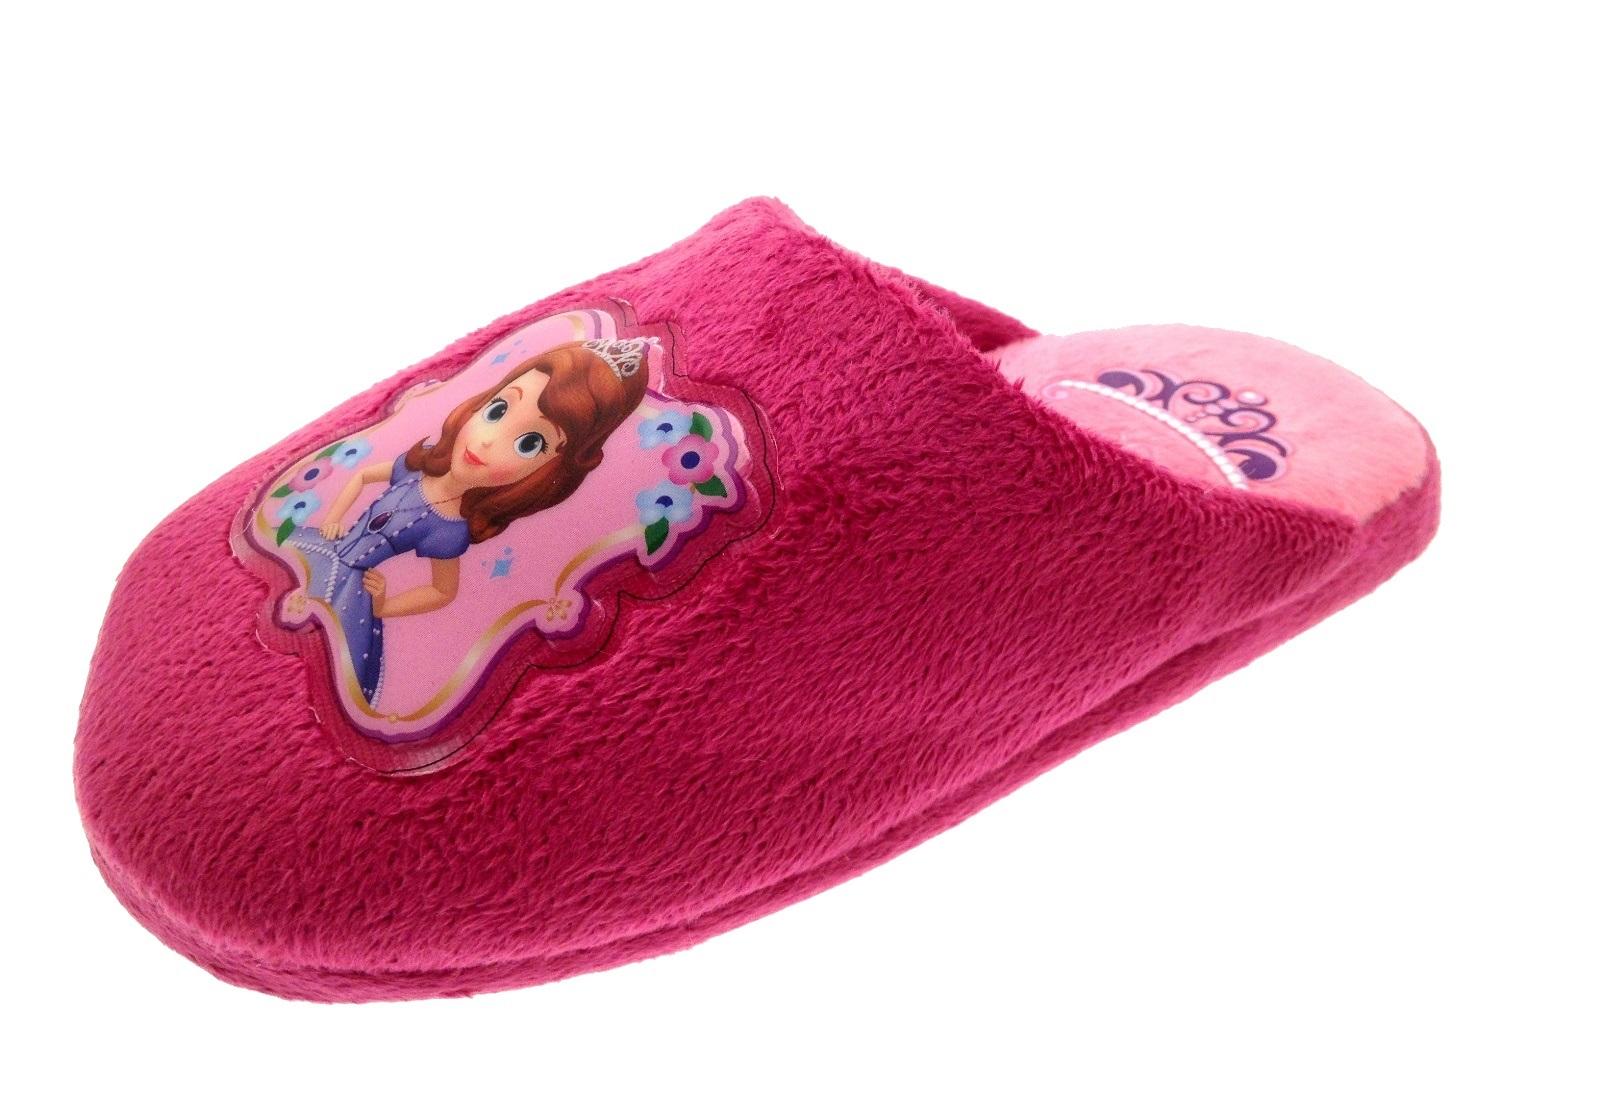 Niñas Princesa Sofia Mary Jane De Ballet Zapatillas Velcro Zapatos Confort mulas Kids